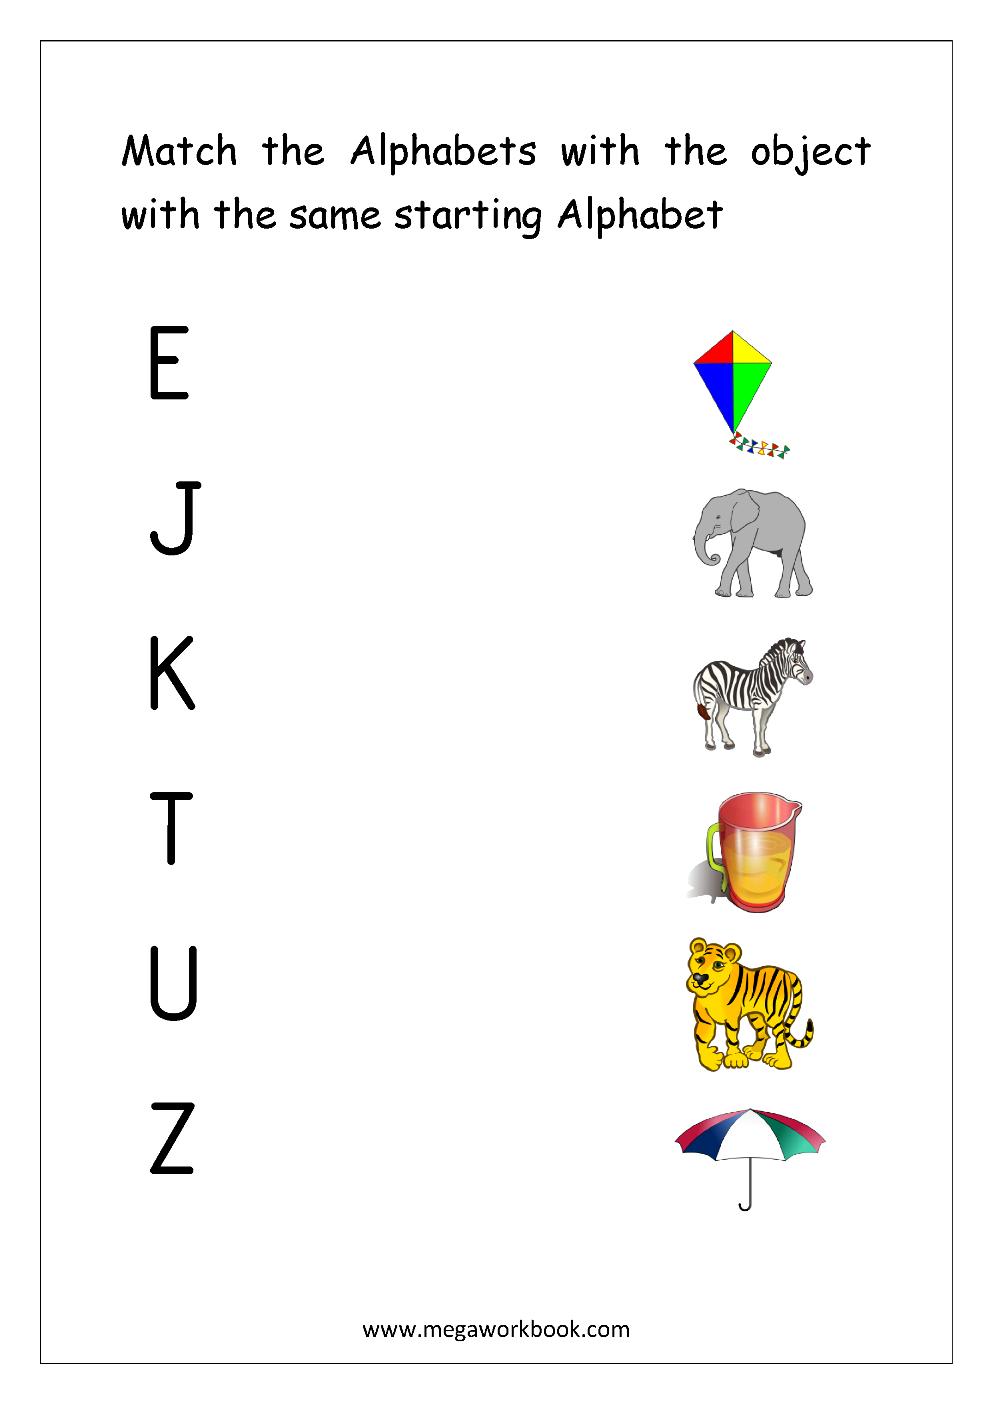 Free English Worksheets - Alphabet Matching - Megaworkbook inside Alphabet Worksheets Matching